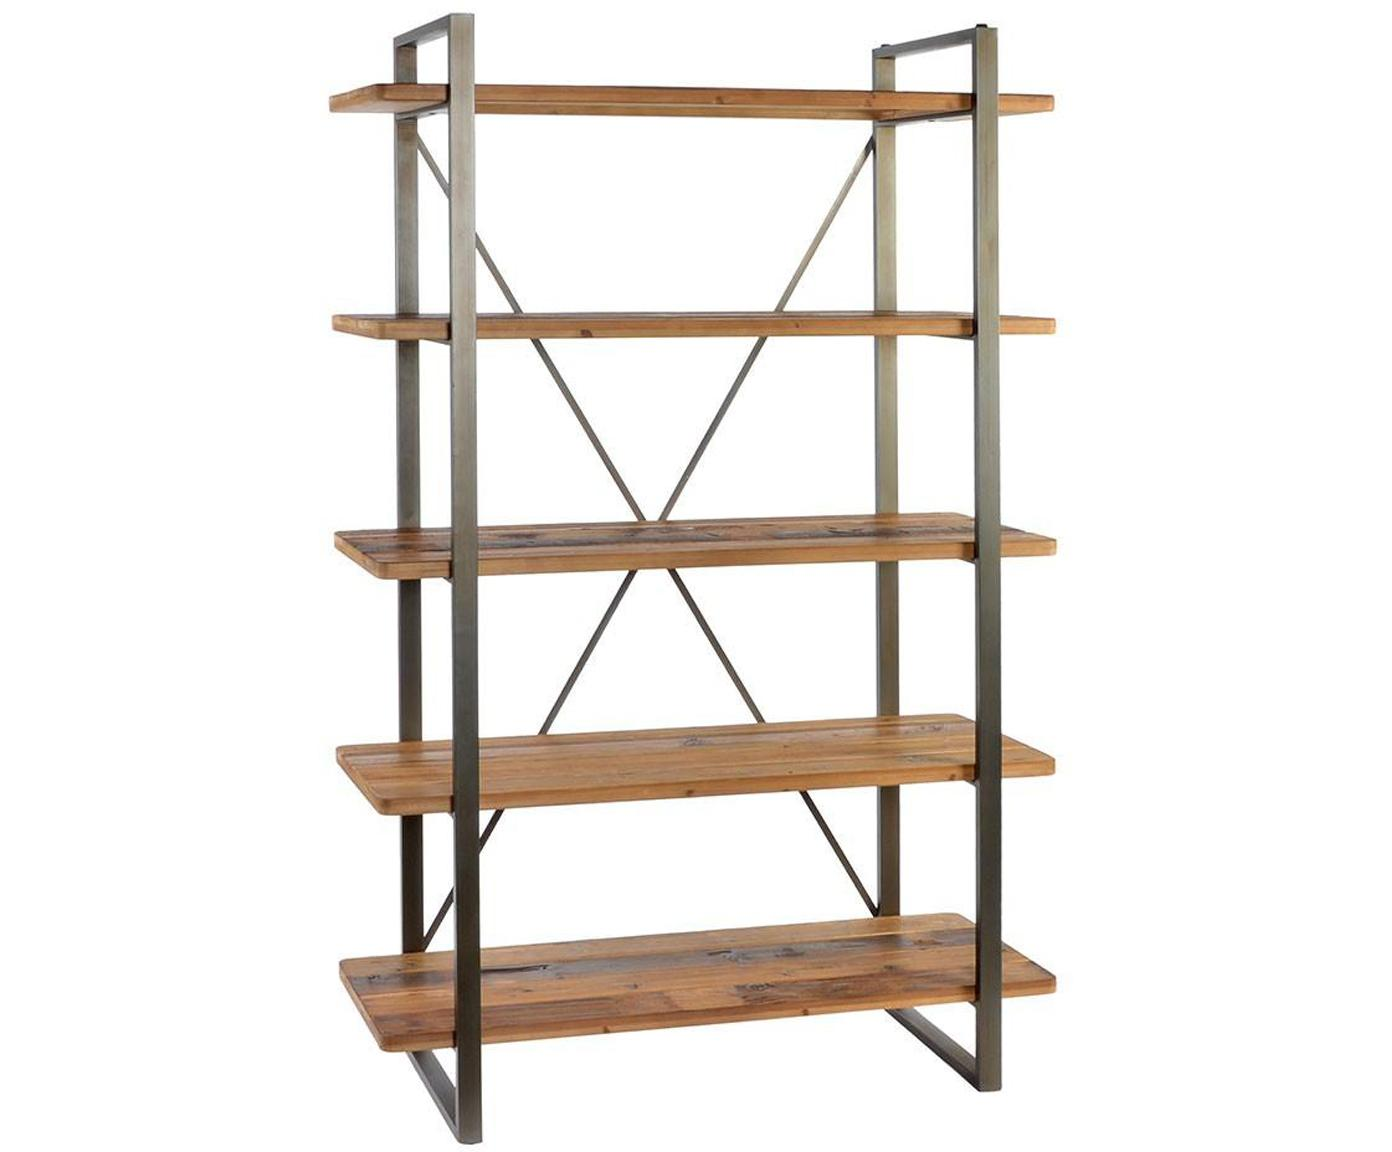 Estantería Angela, Estructura: metal, Estantes: madera de abeto, Marrón, An 120 x Al 186 cm